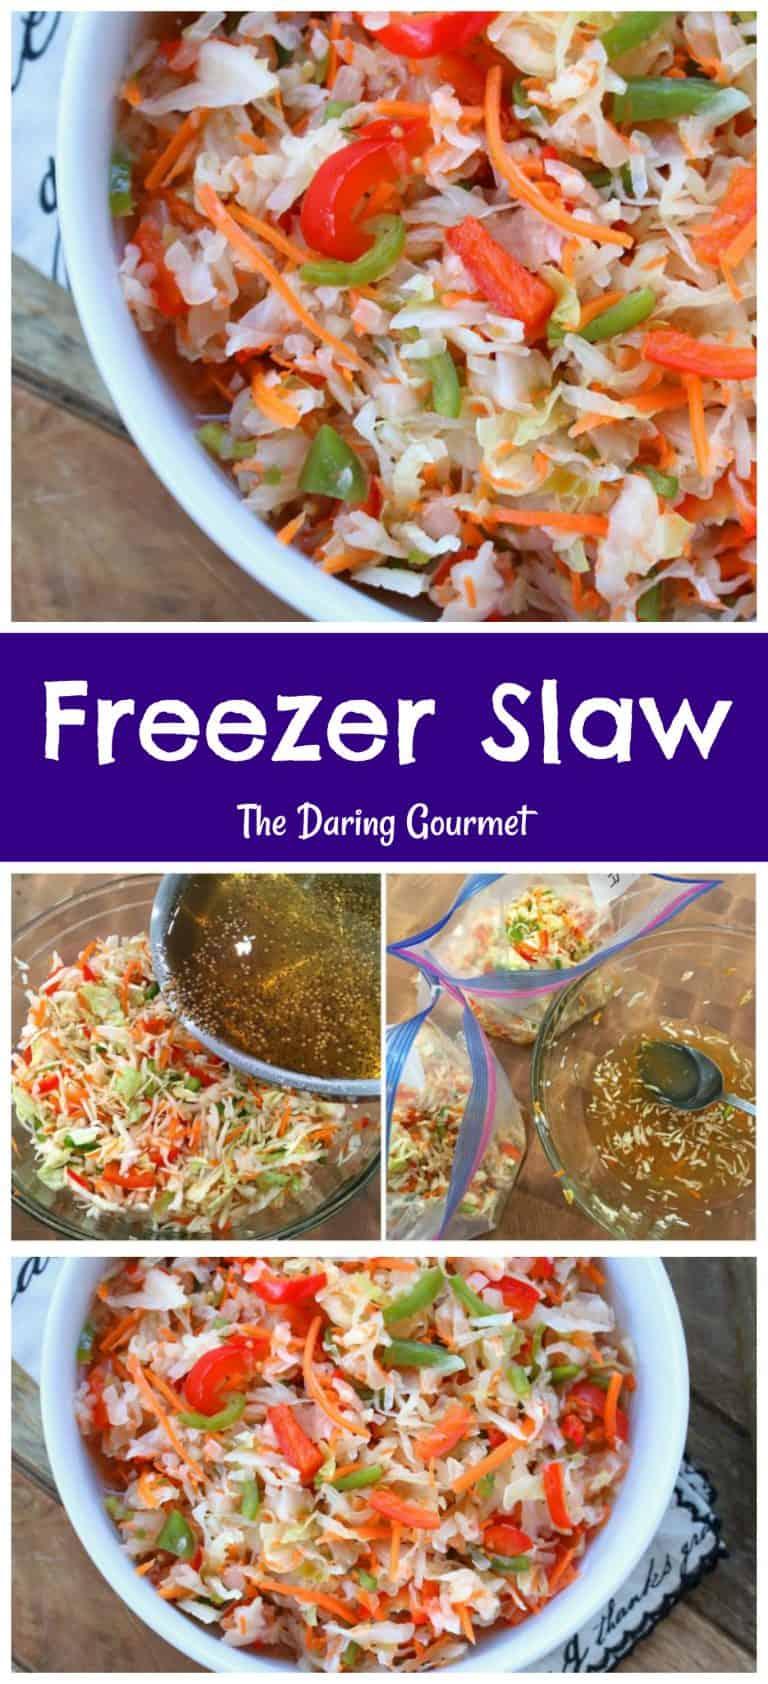 freezer slaw recipe coleslaw make ahead